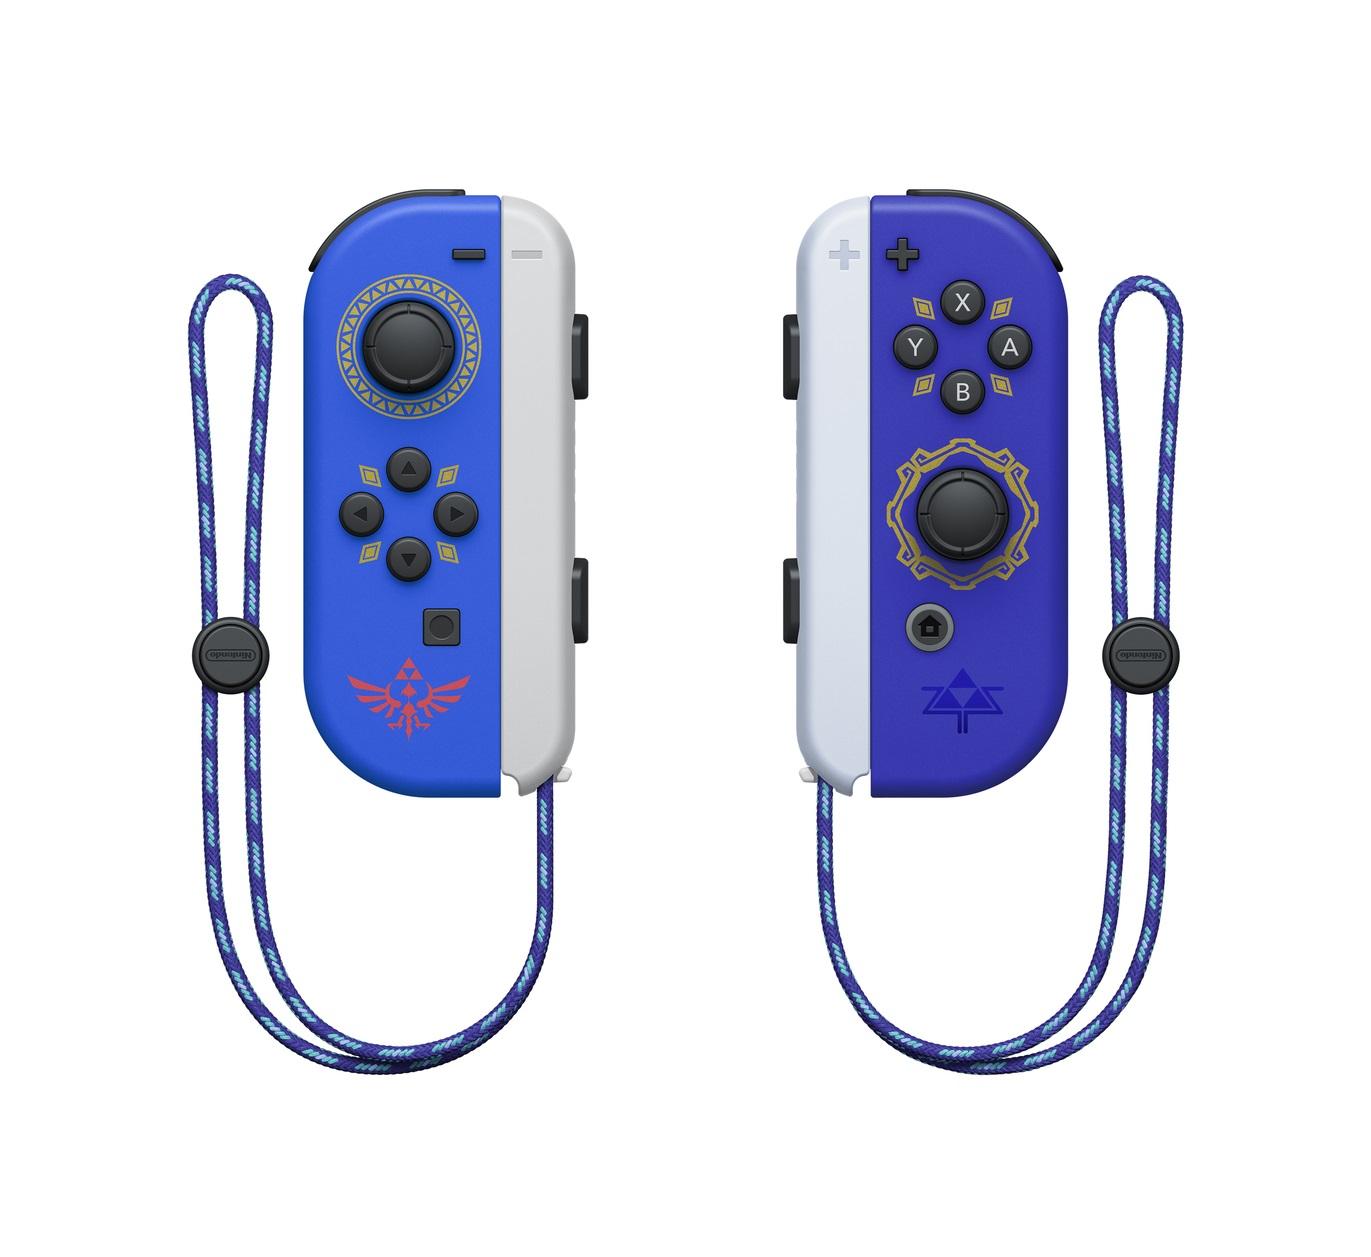 Controle Joy-Con - Zelda: Skyward Sword - Nintendo Switch - Pré Venda -  Envio Internacional - Frete Grátis